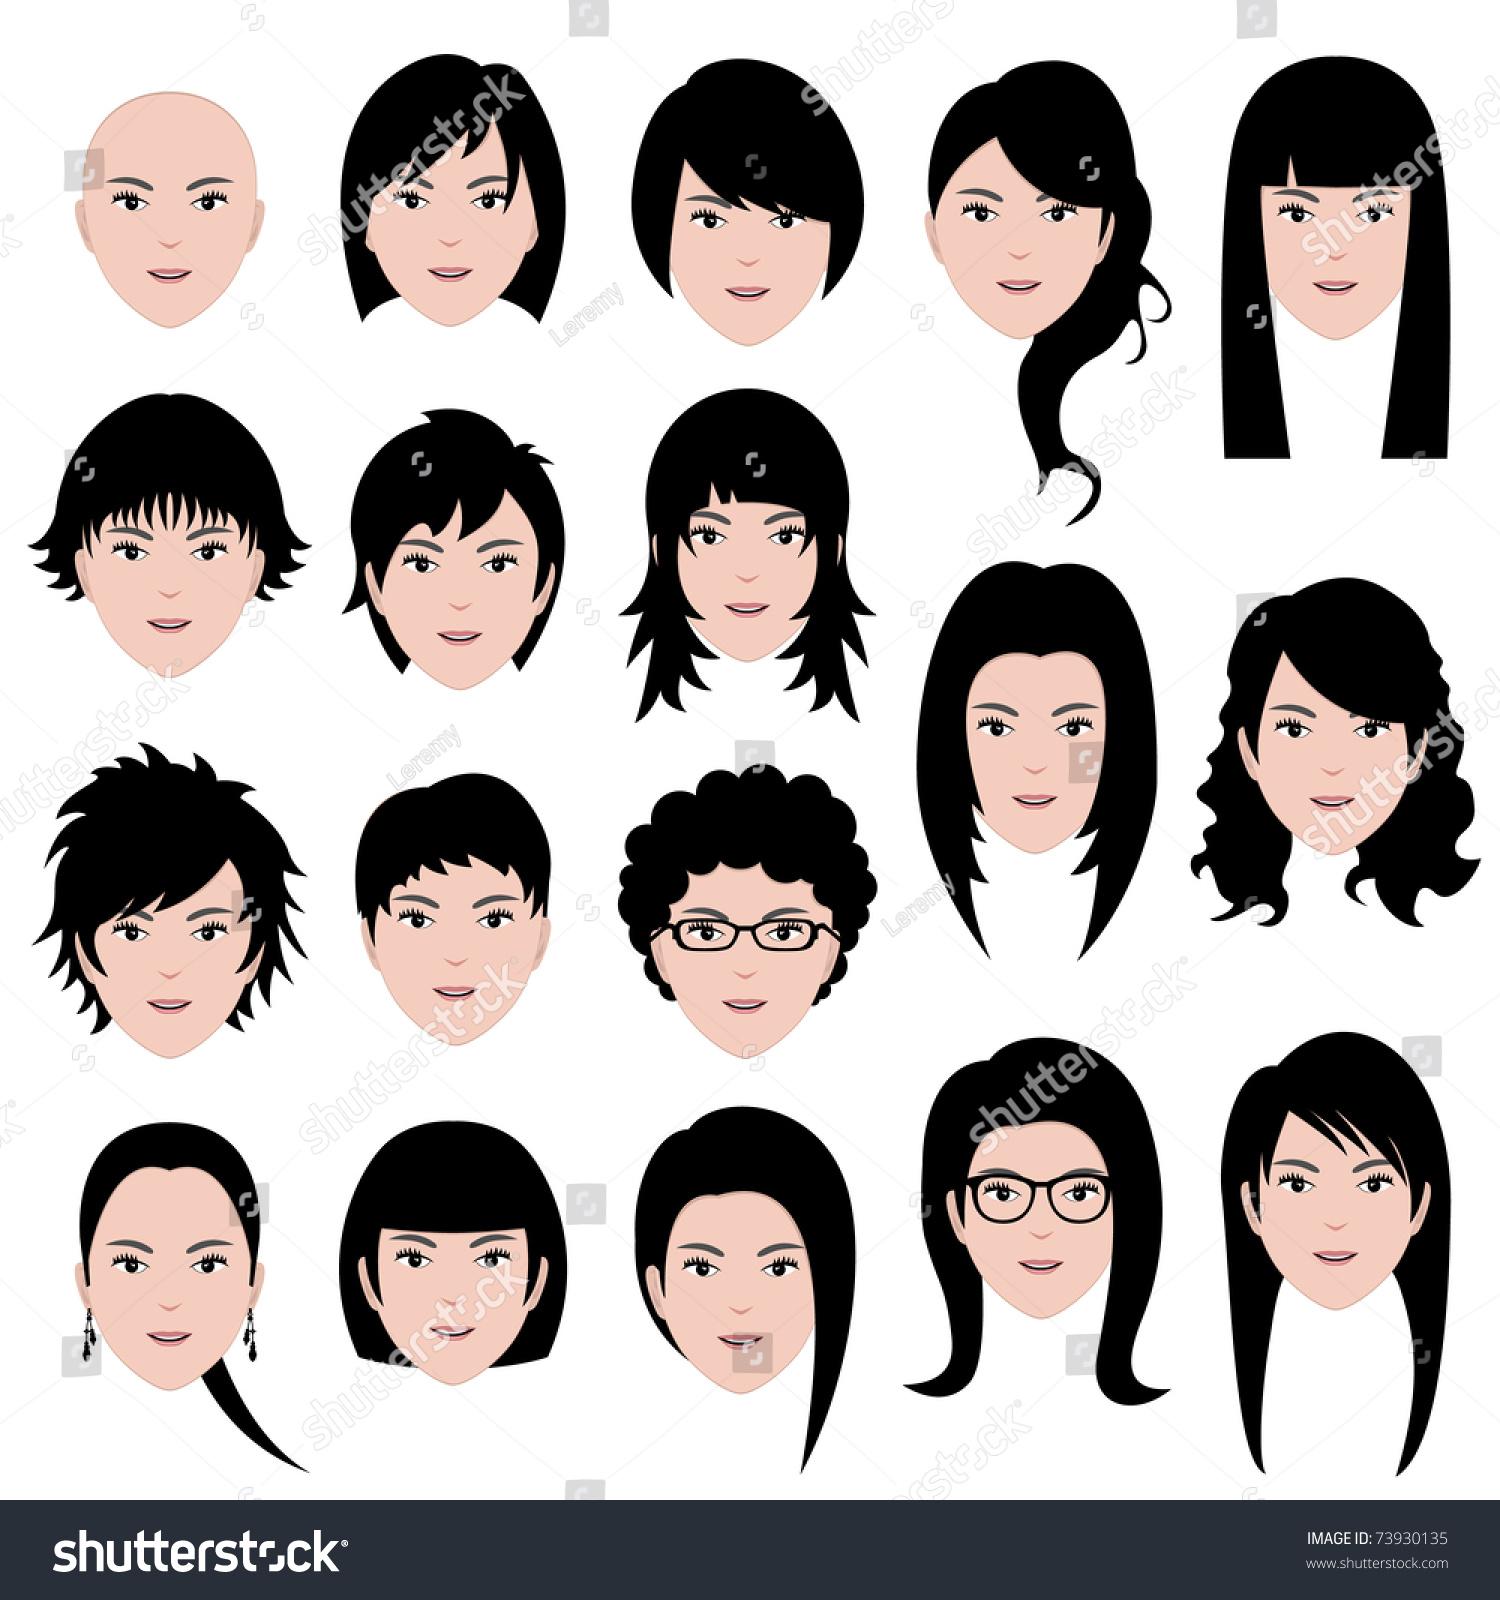 clipart human face - photo #38